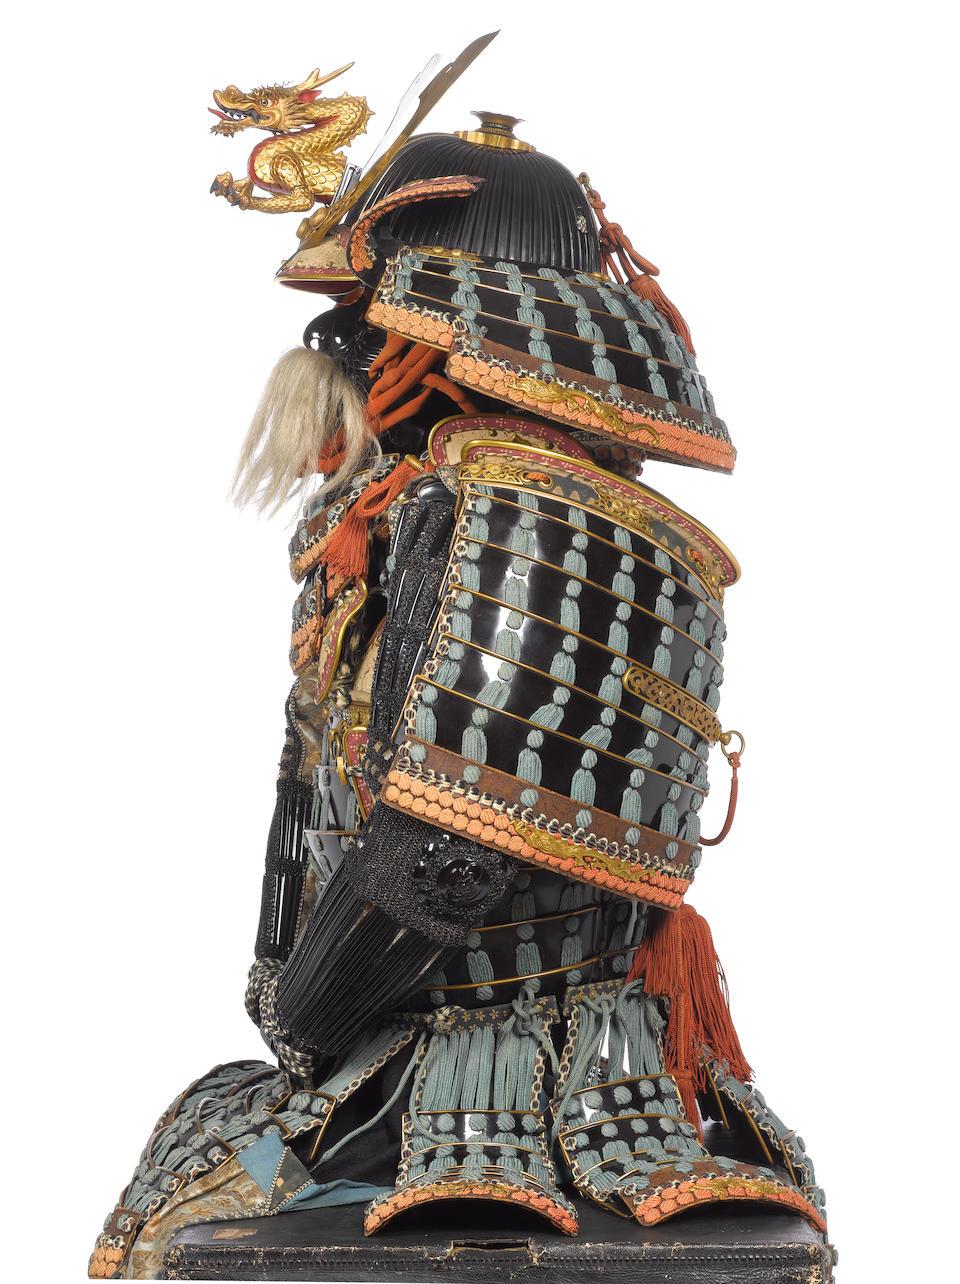 An exceptional mogami do tosei gusoku armour Edo Period, 18th to 19th century; helmet signed Myochin...Naga, late Muromachi/early Momoyama Period, 16th century